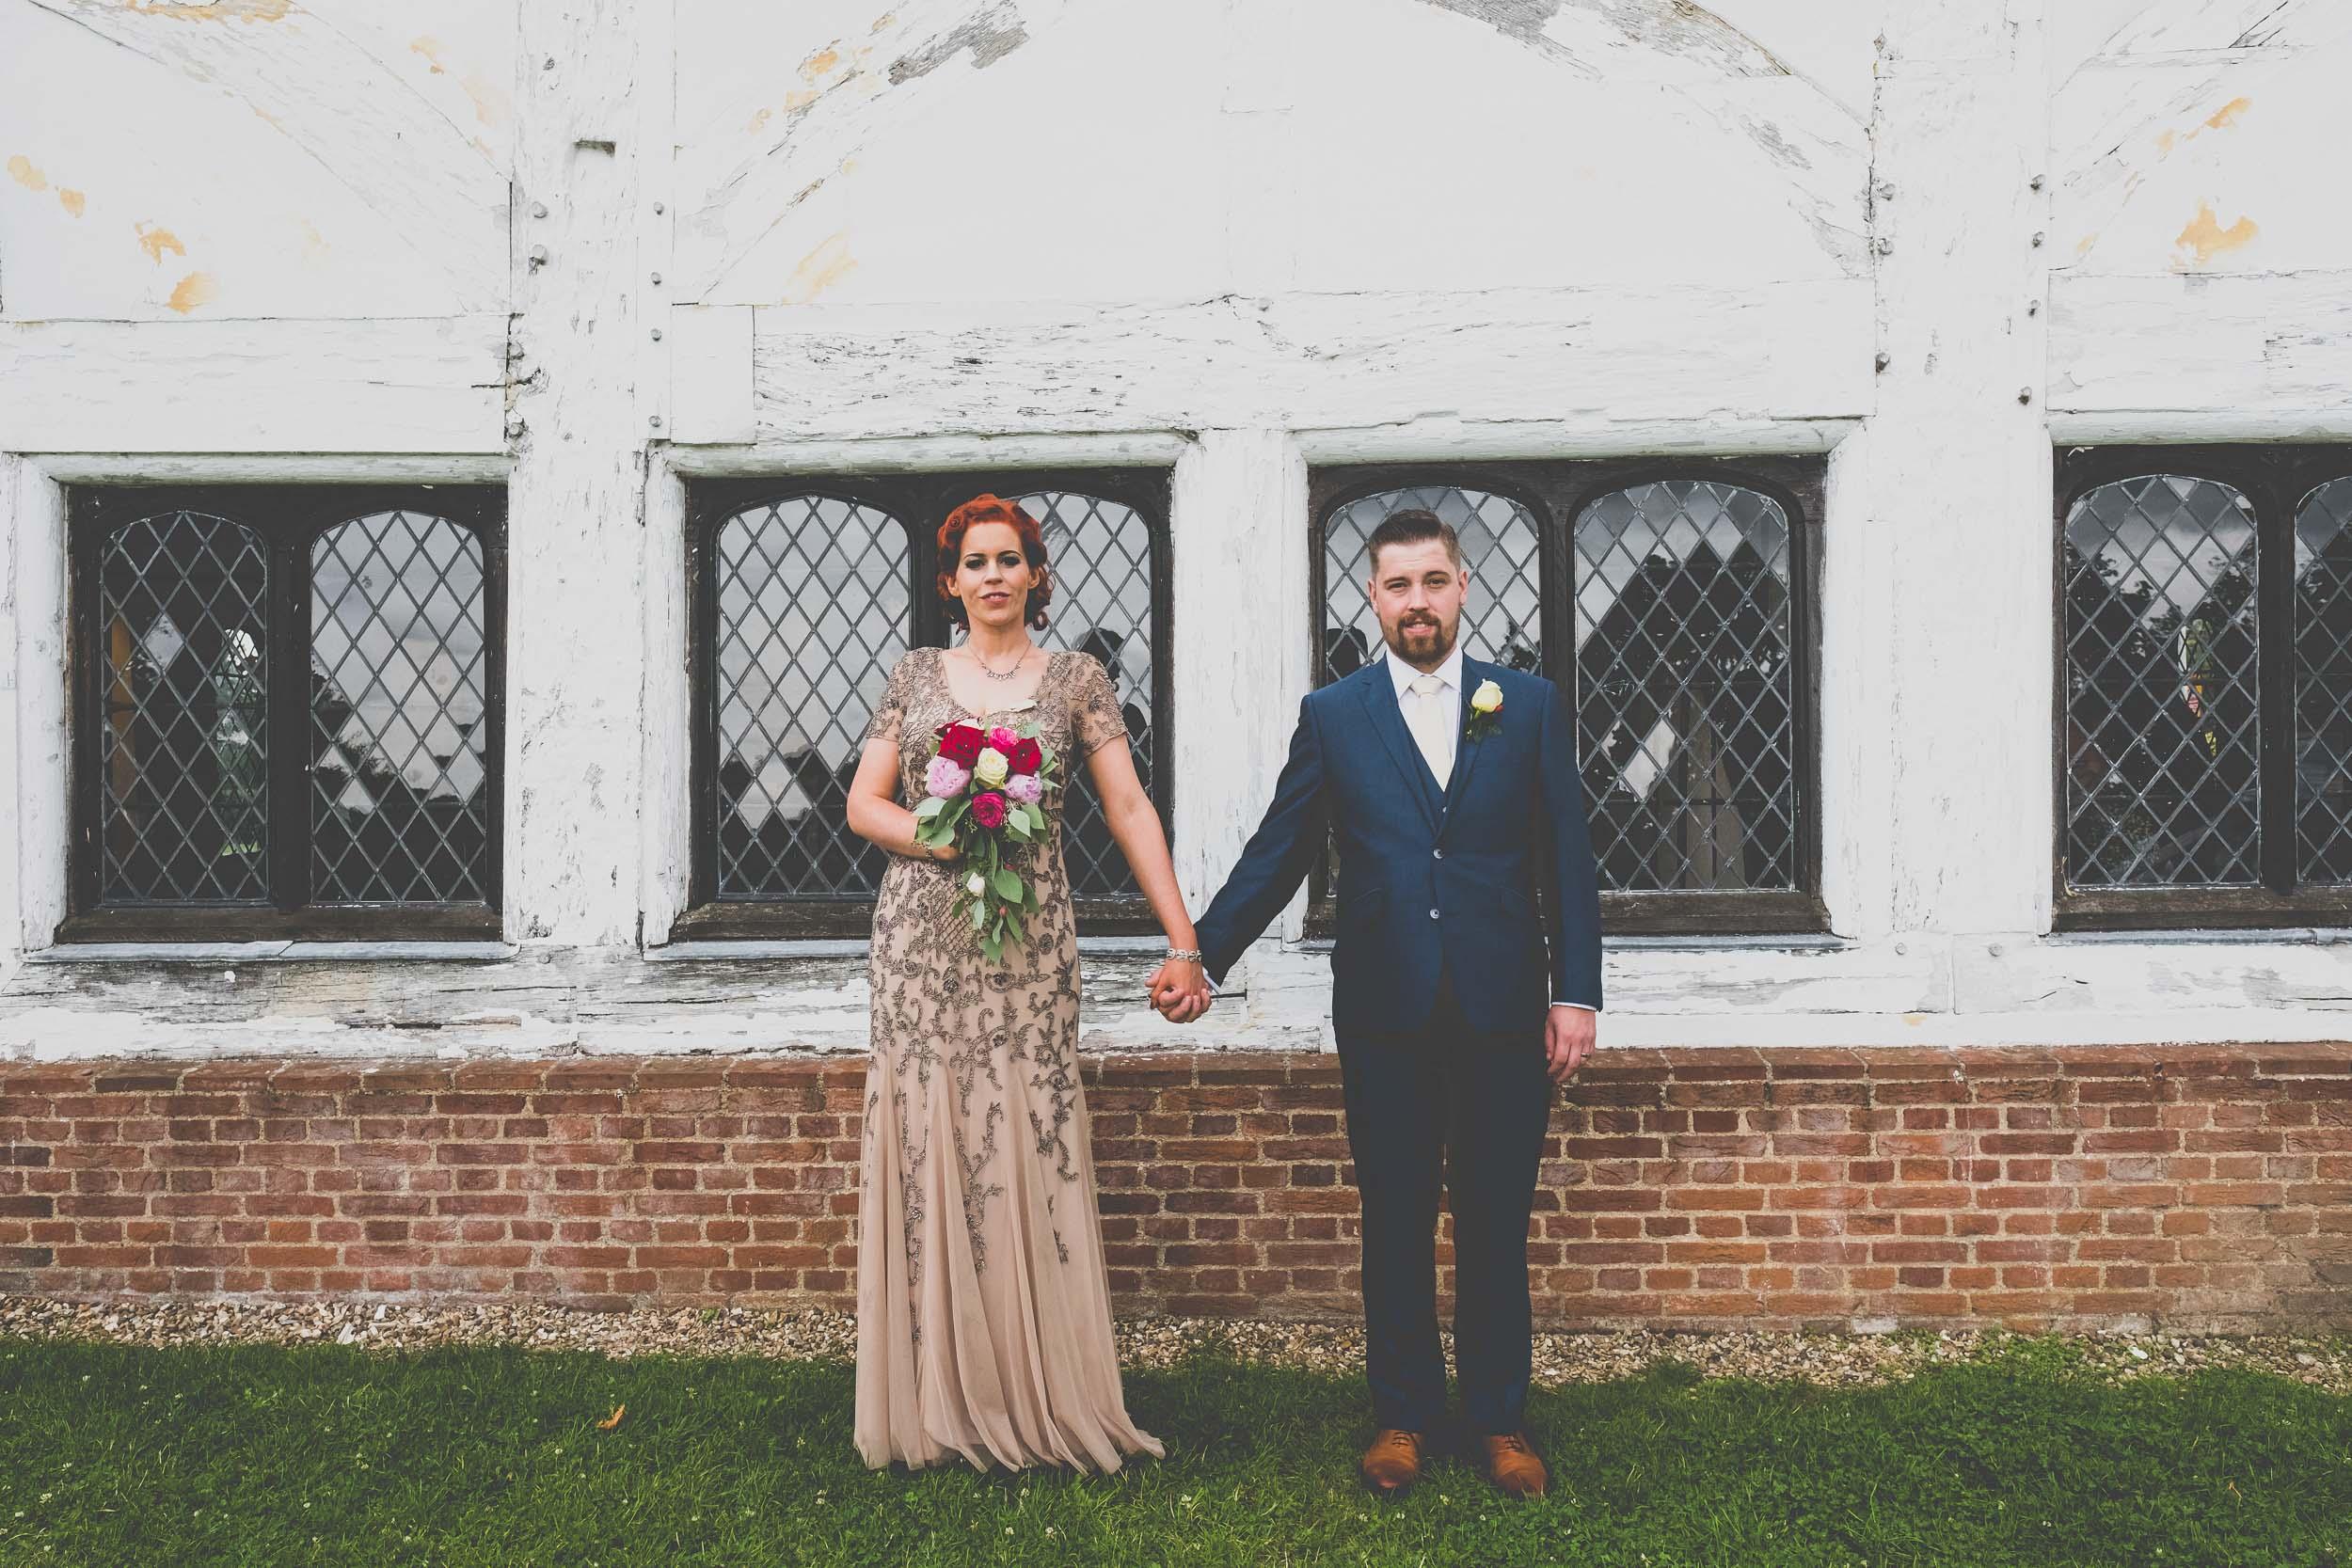 queen-elizabeths-hunting-lodge-epping-forest-wedding163.jpg